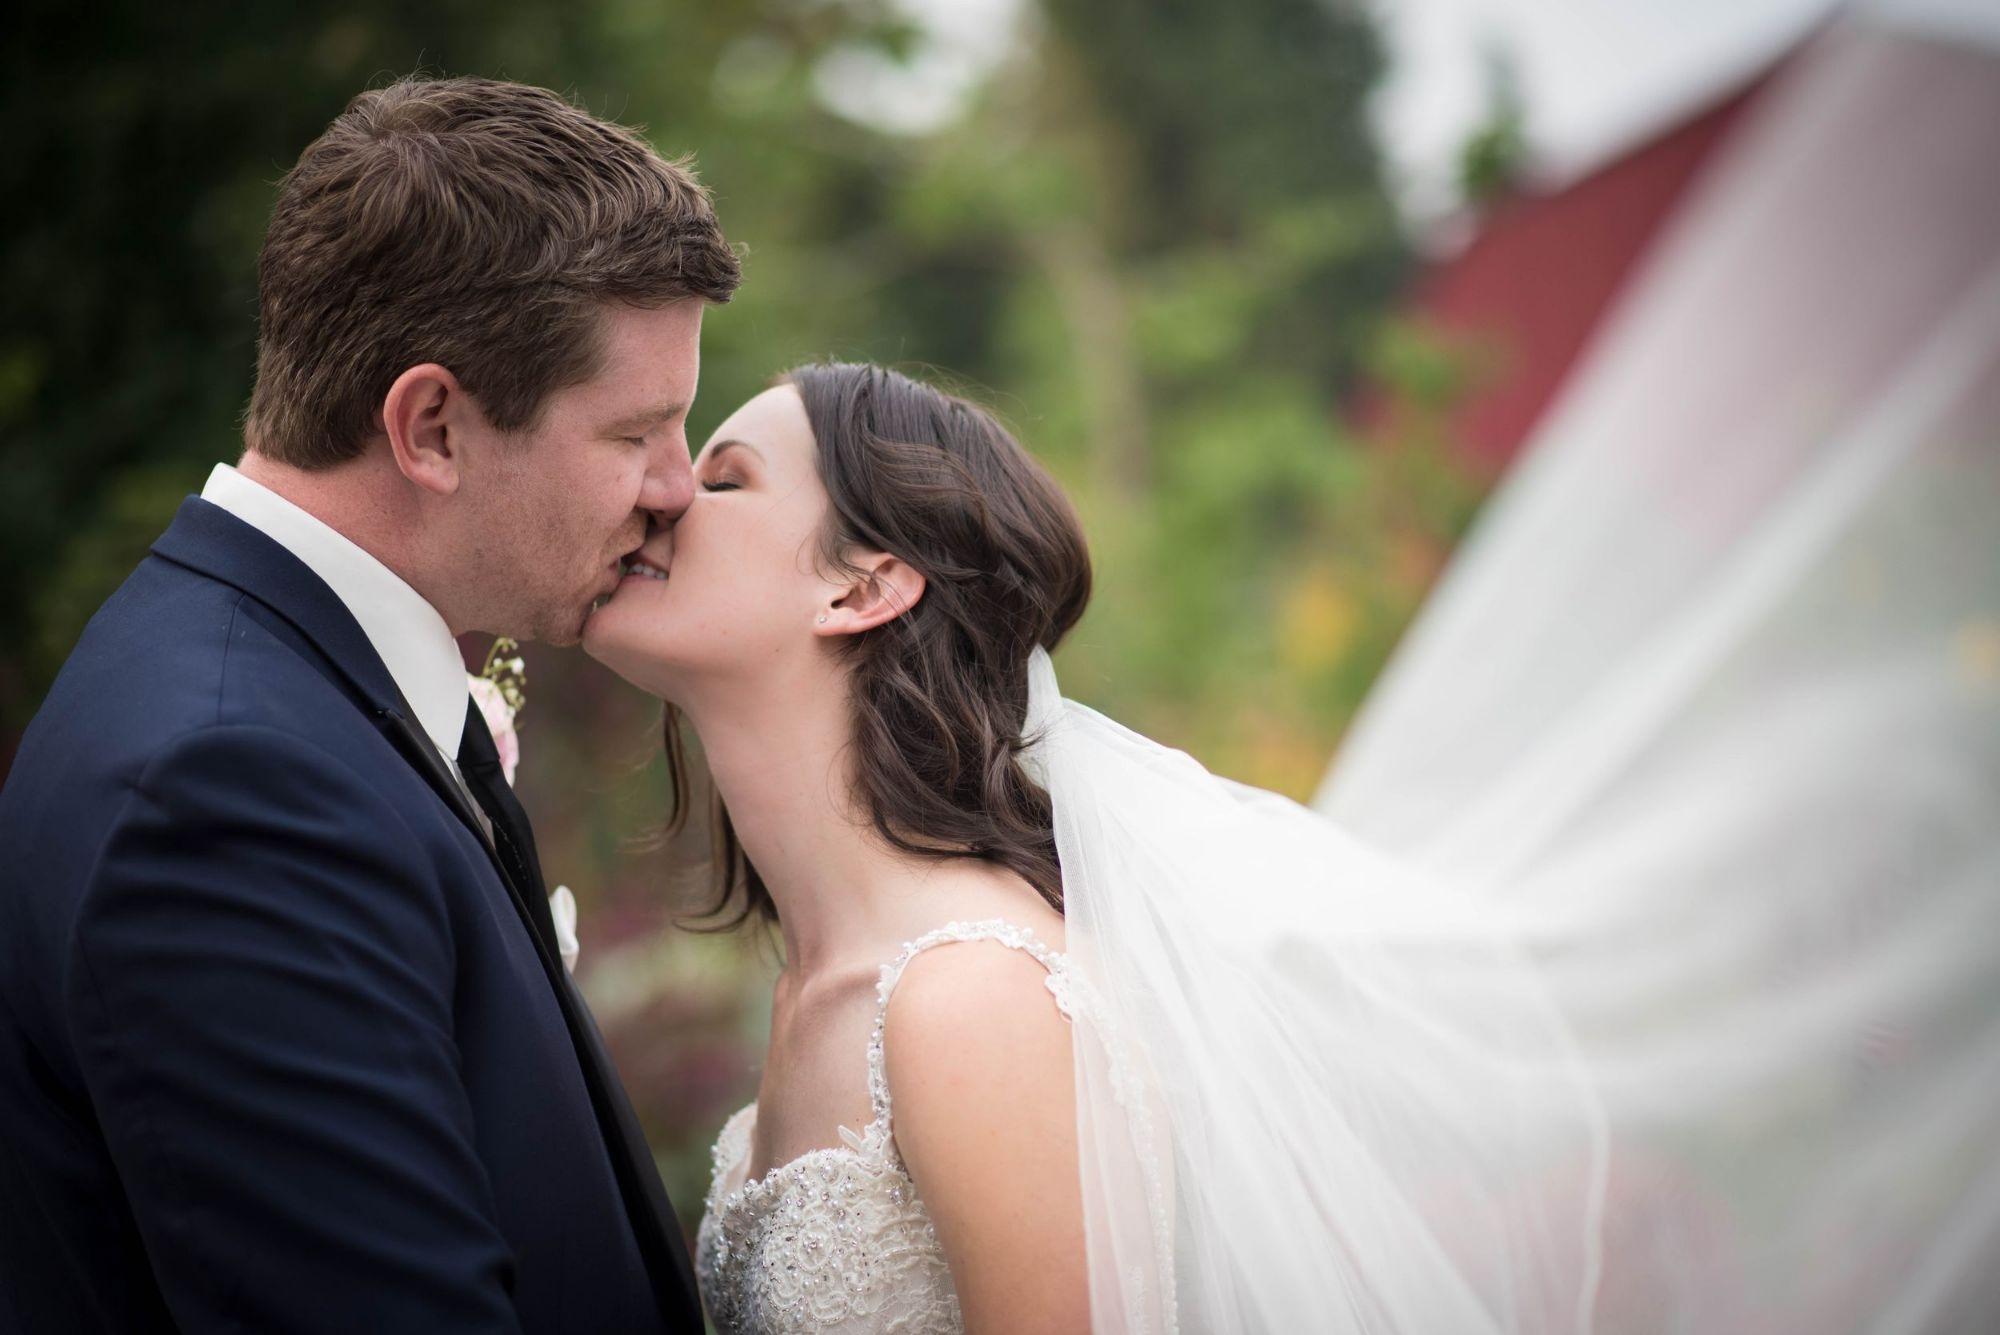 Nadine McKenney Photography's Simple Wedding Photography Photo